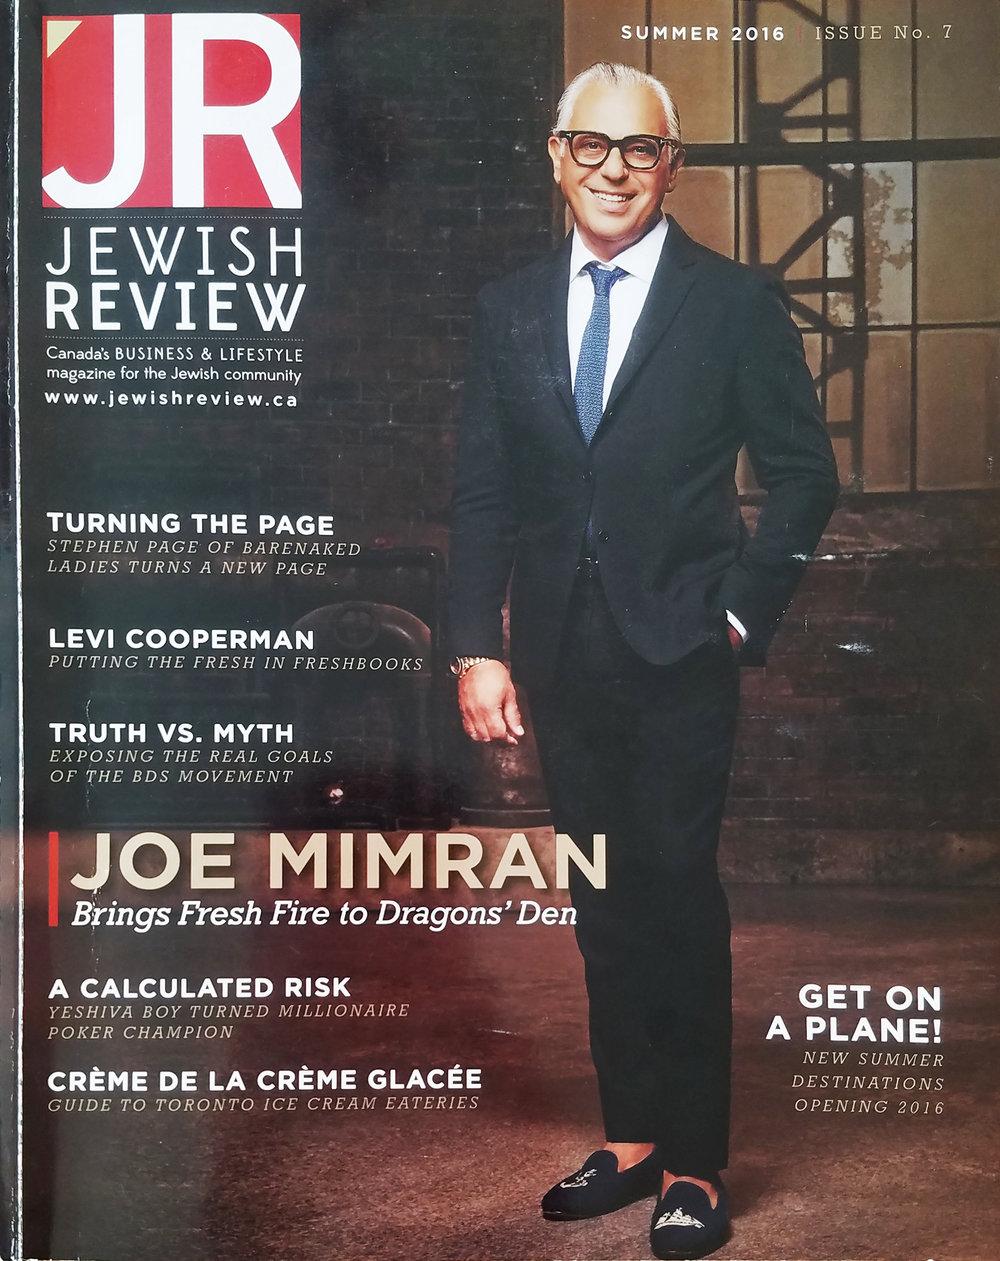 Jewish Review - Summer 2016